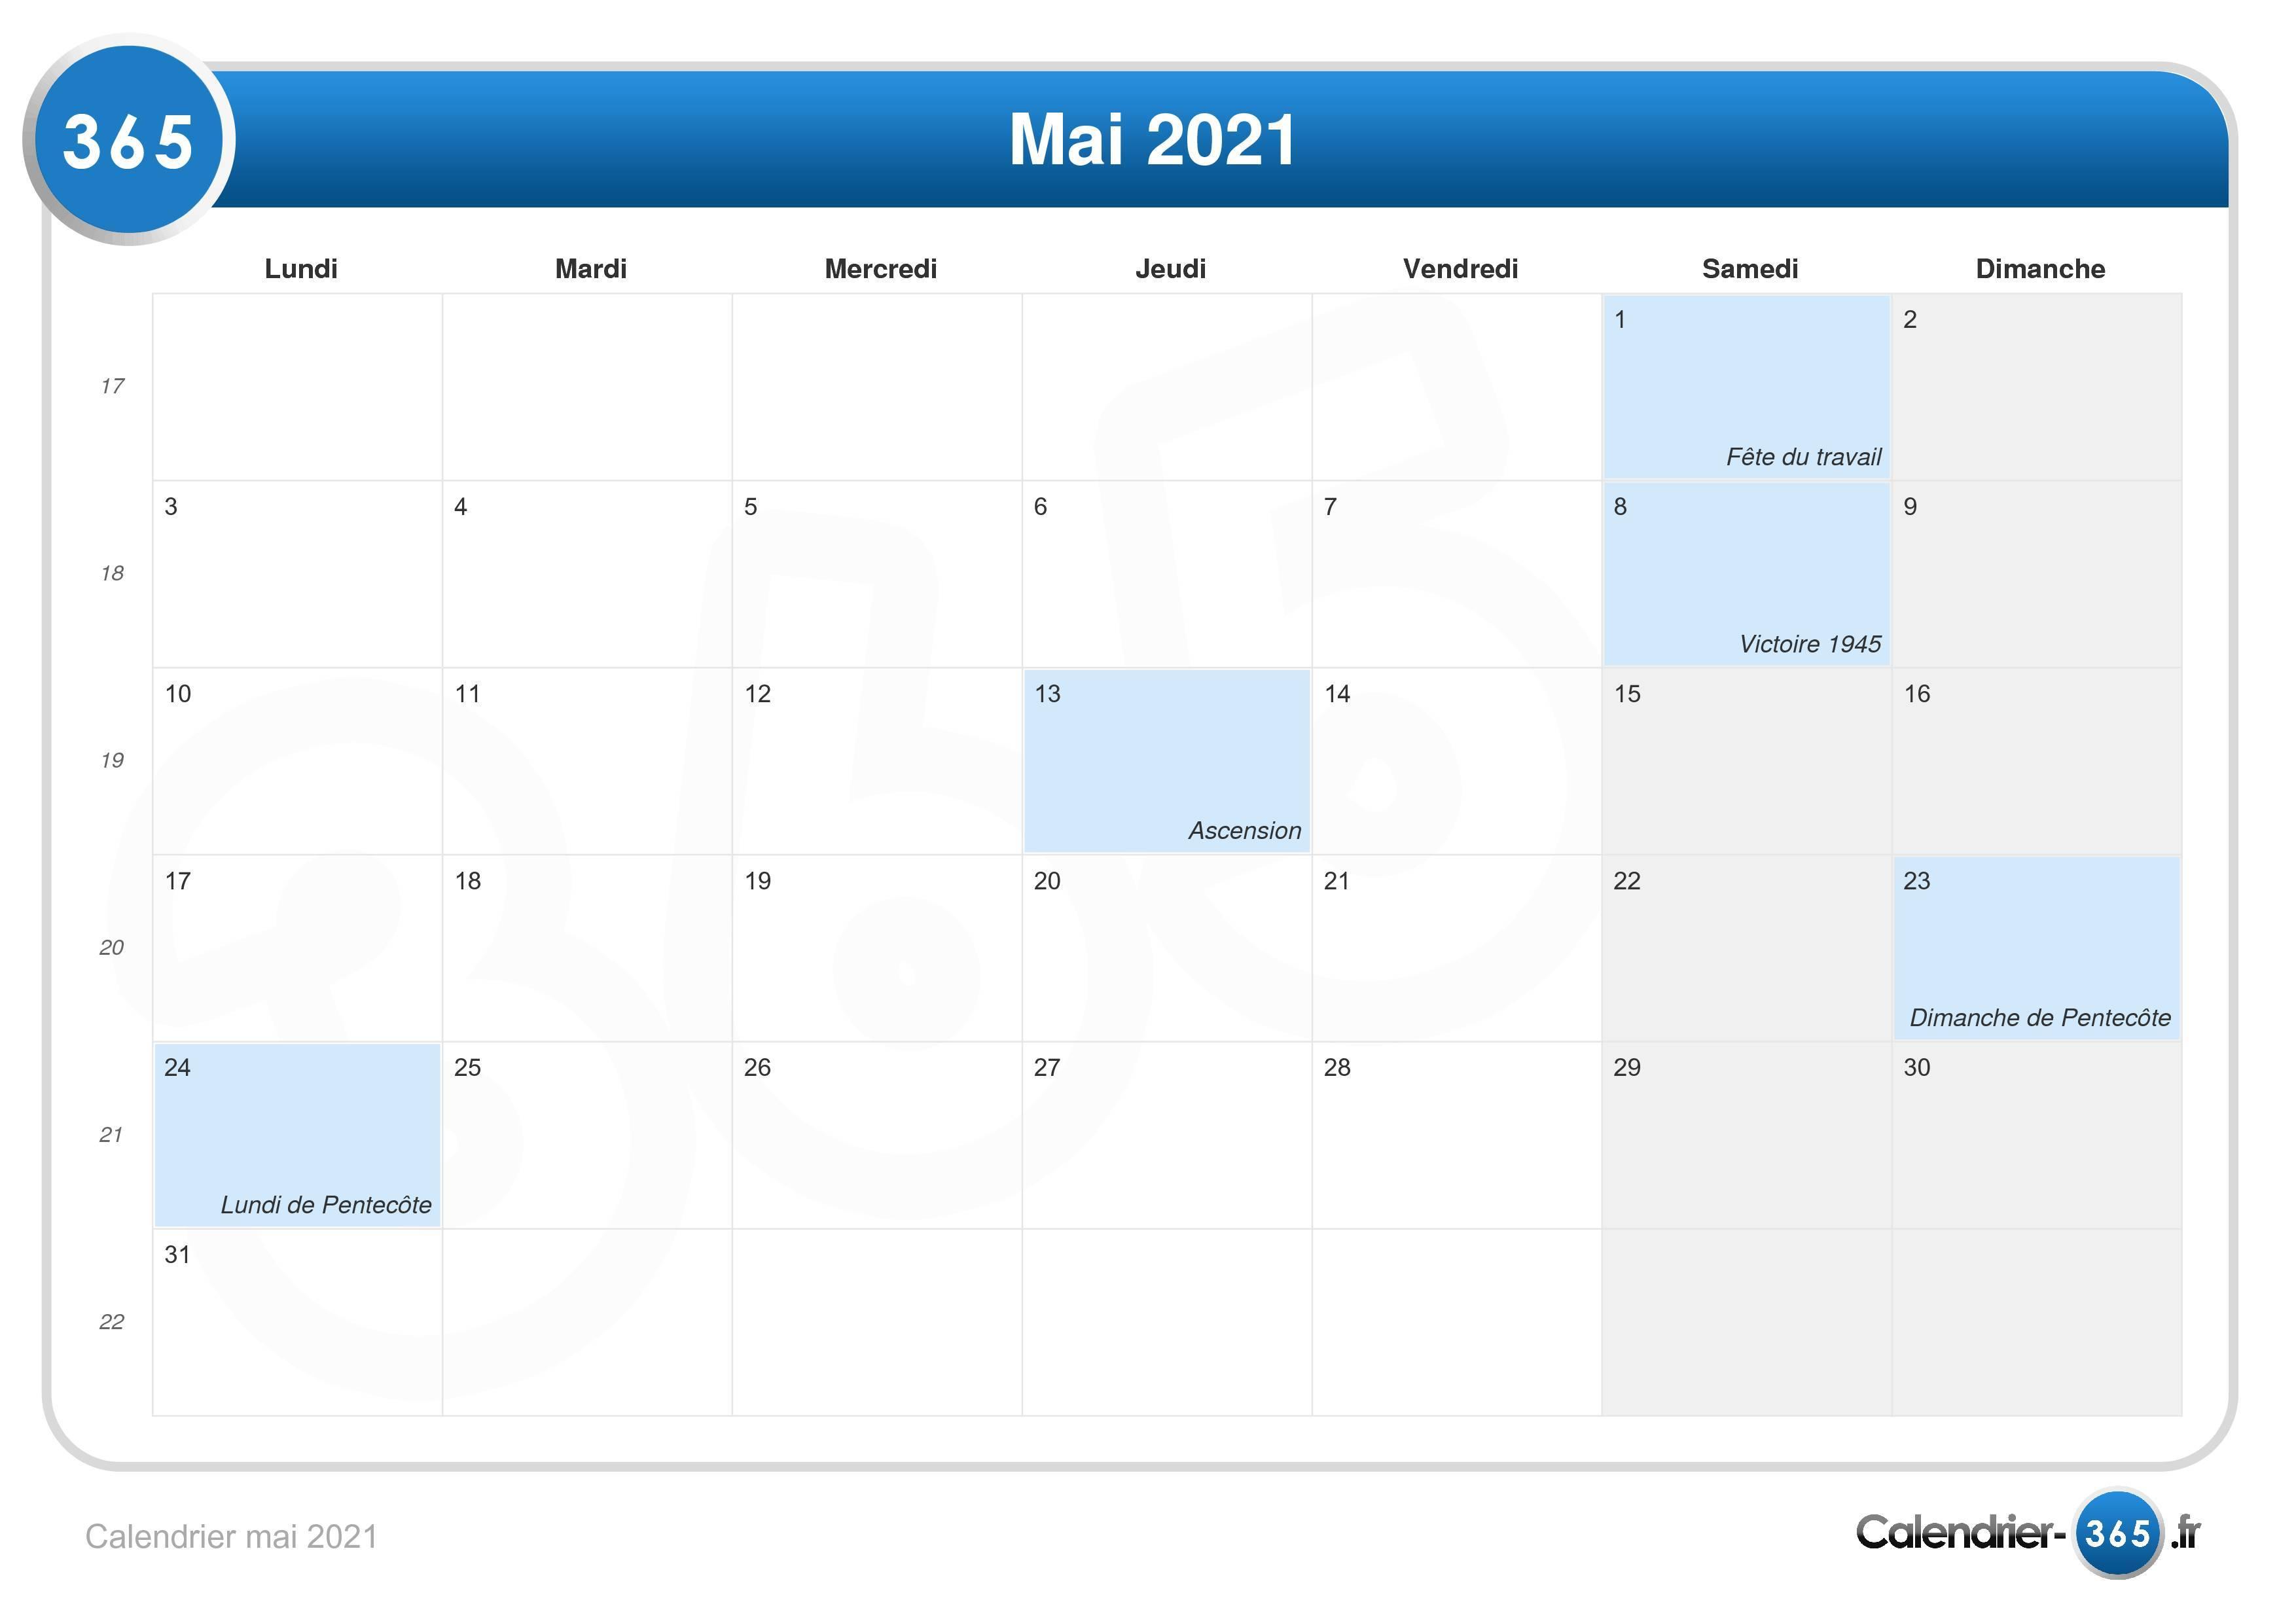 Calendrier mai 2021